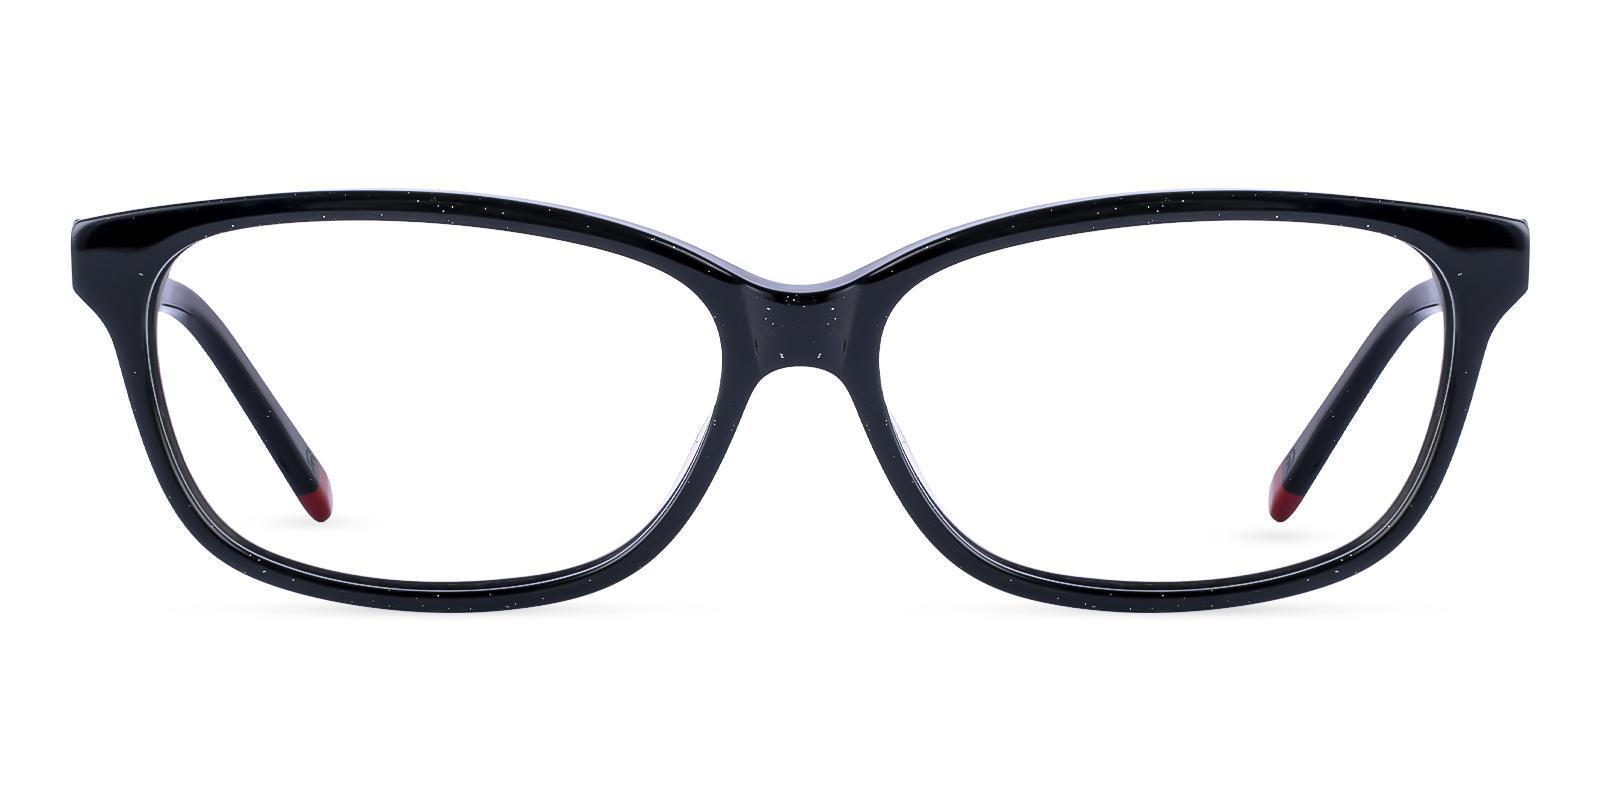 Cyprus Black Acetate Eyeglasses , SpringHinges , UniversalBridgeFit Frames from ABBE Glasses